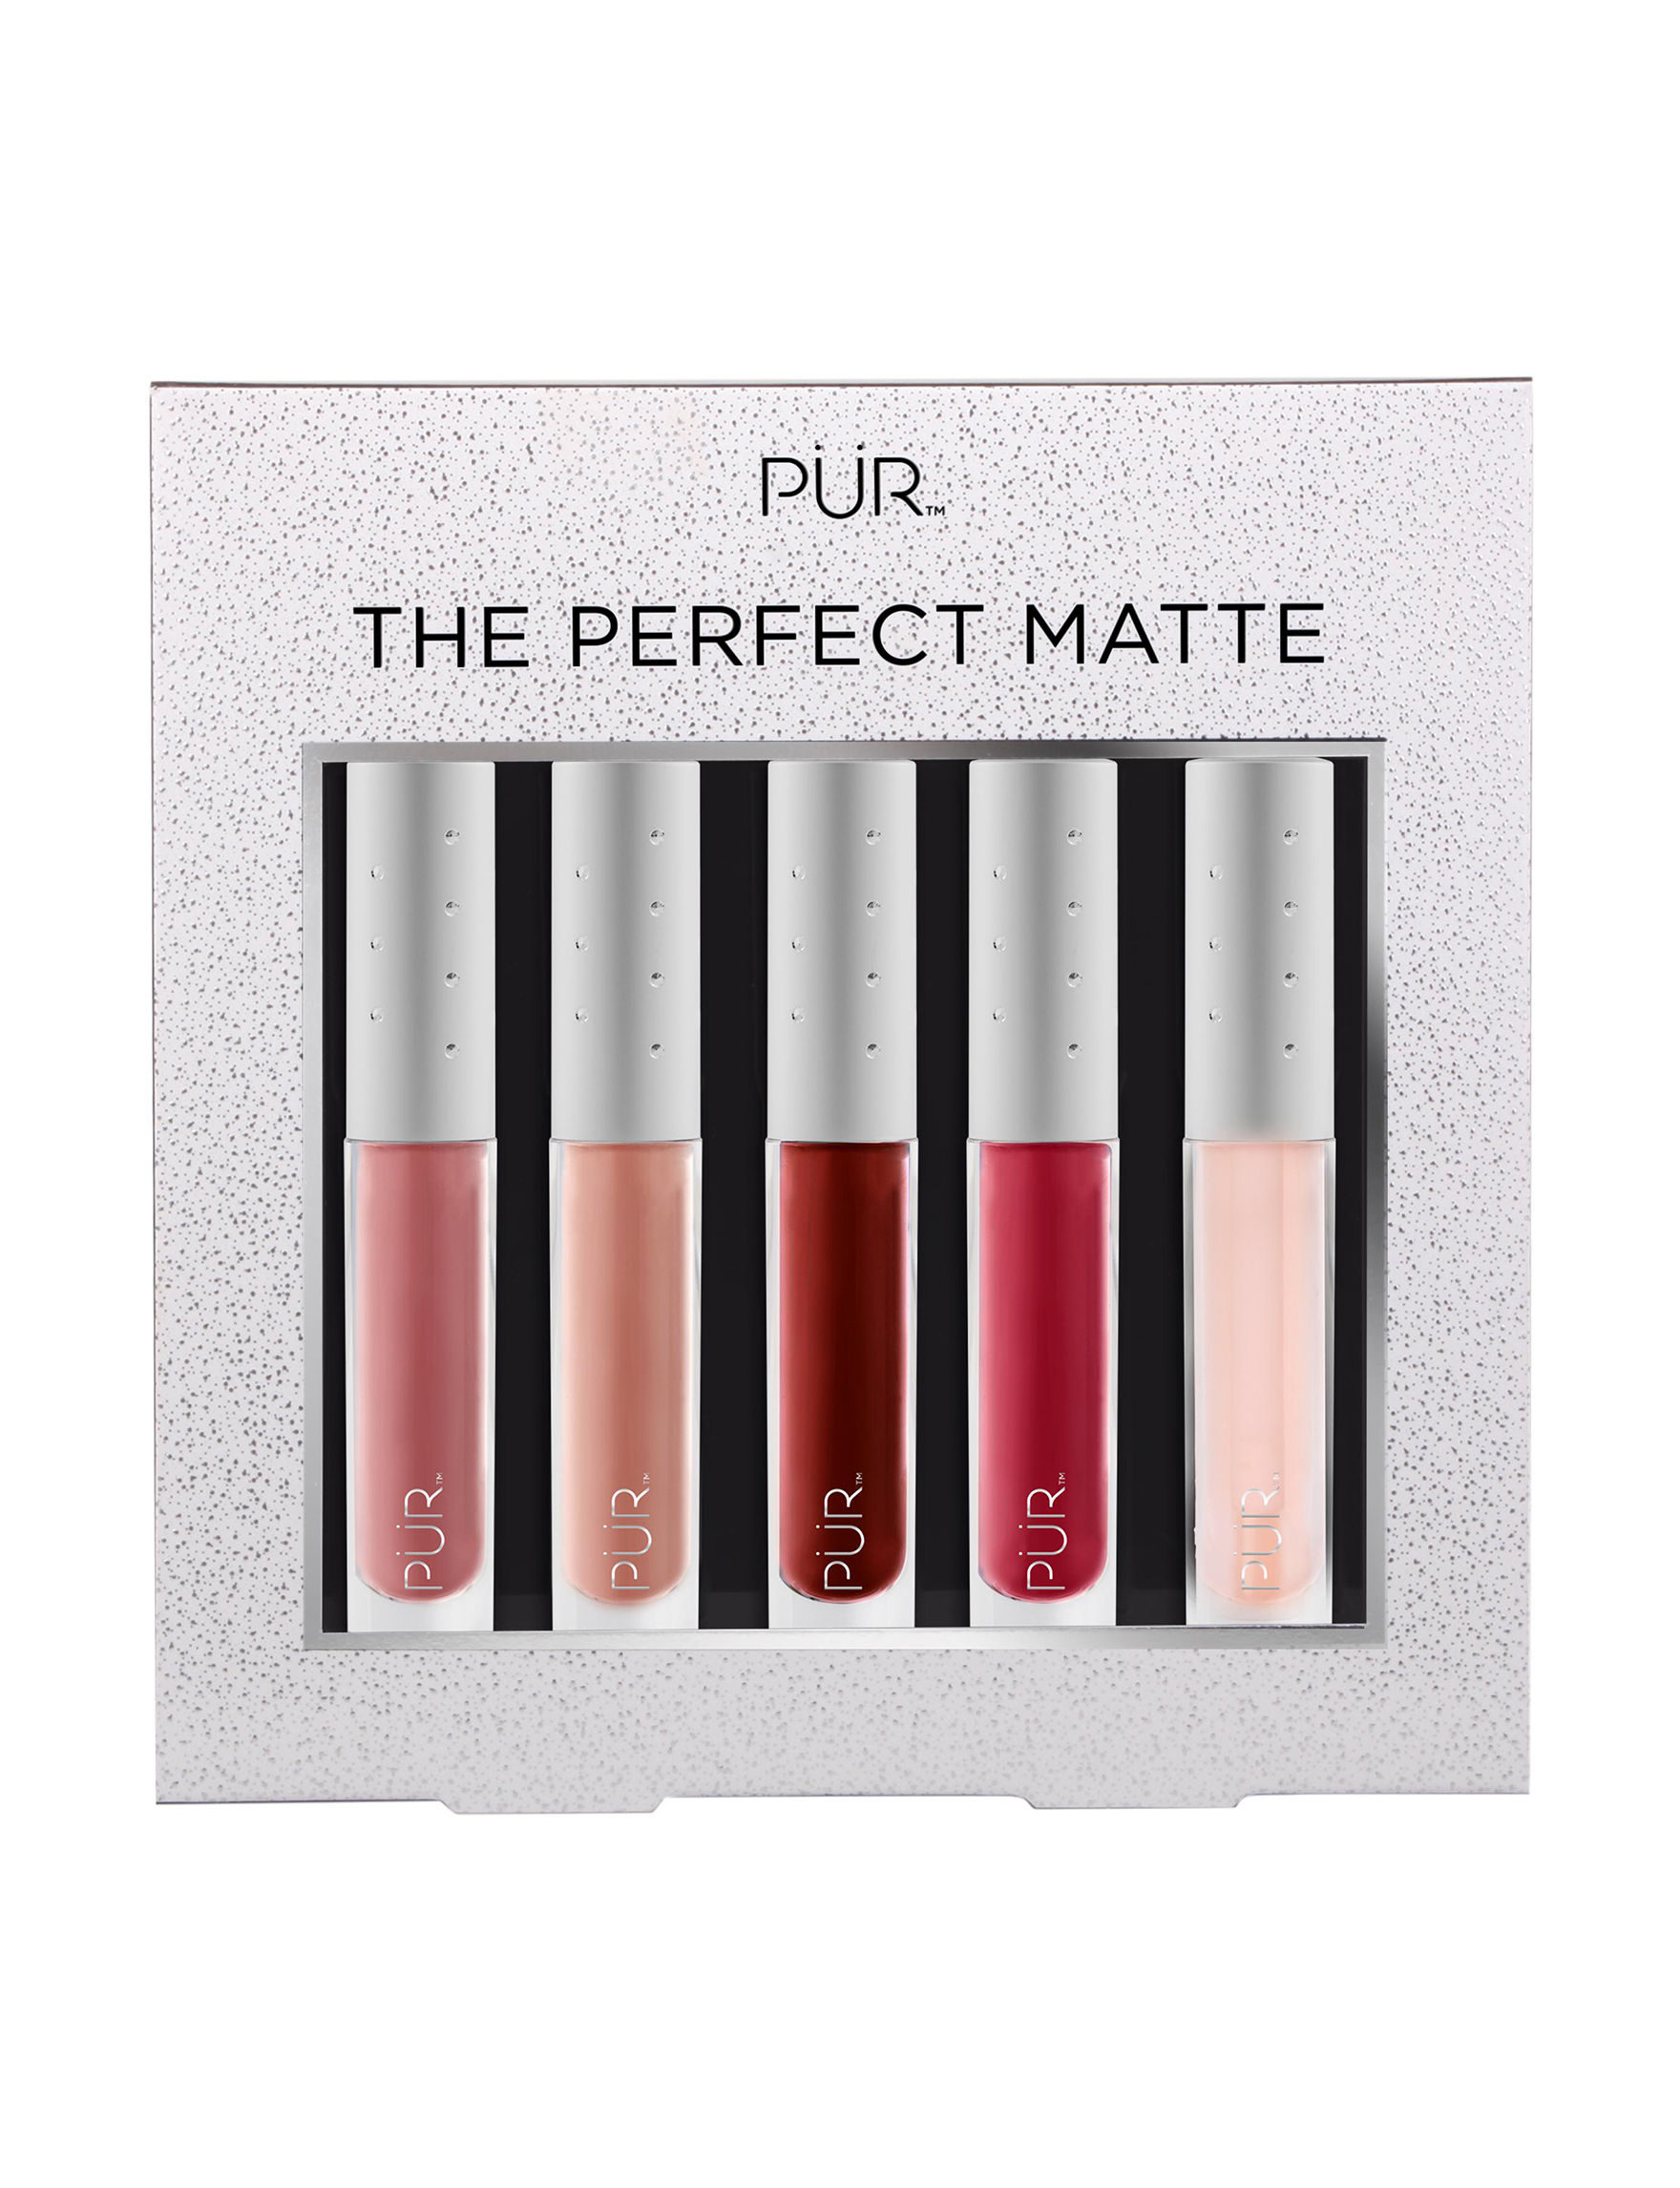 Pur  Lips Makeup Kits & Sets Lipstick